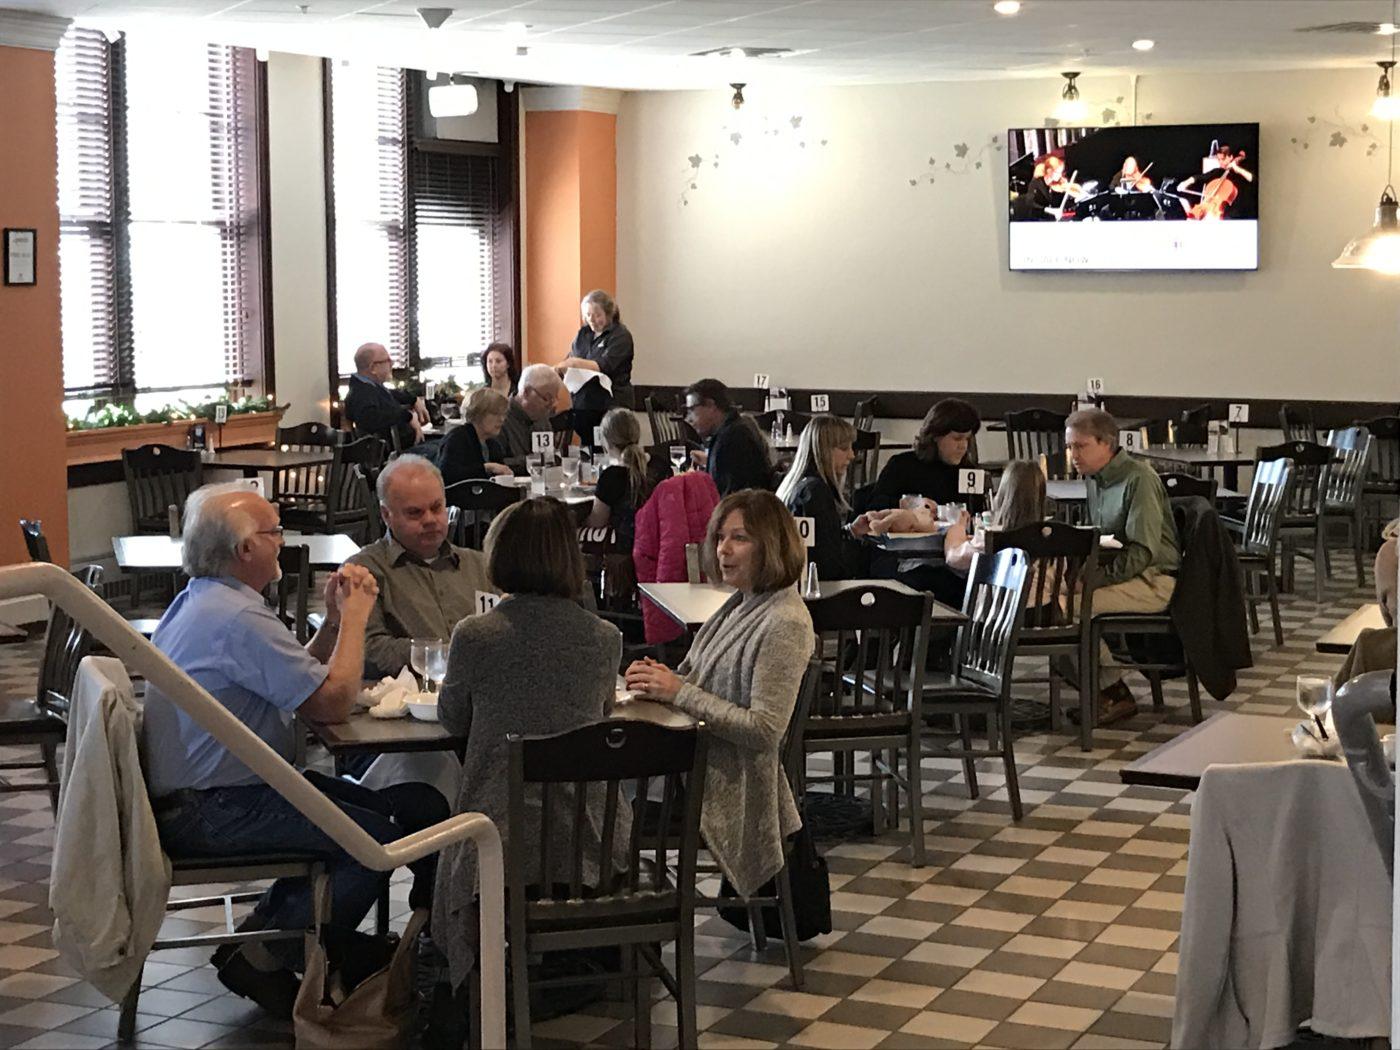 Image of Sunday brunch at Leonardo's Cafe